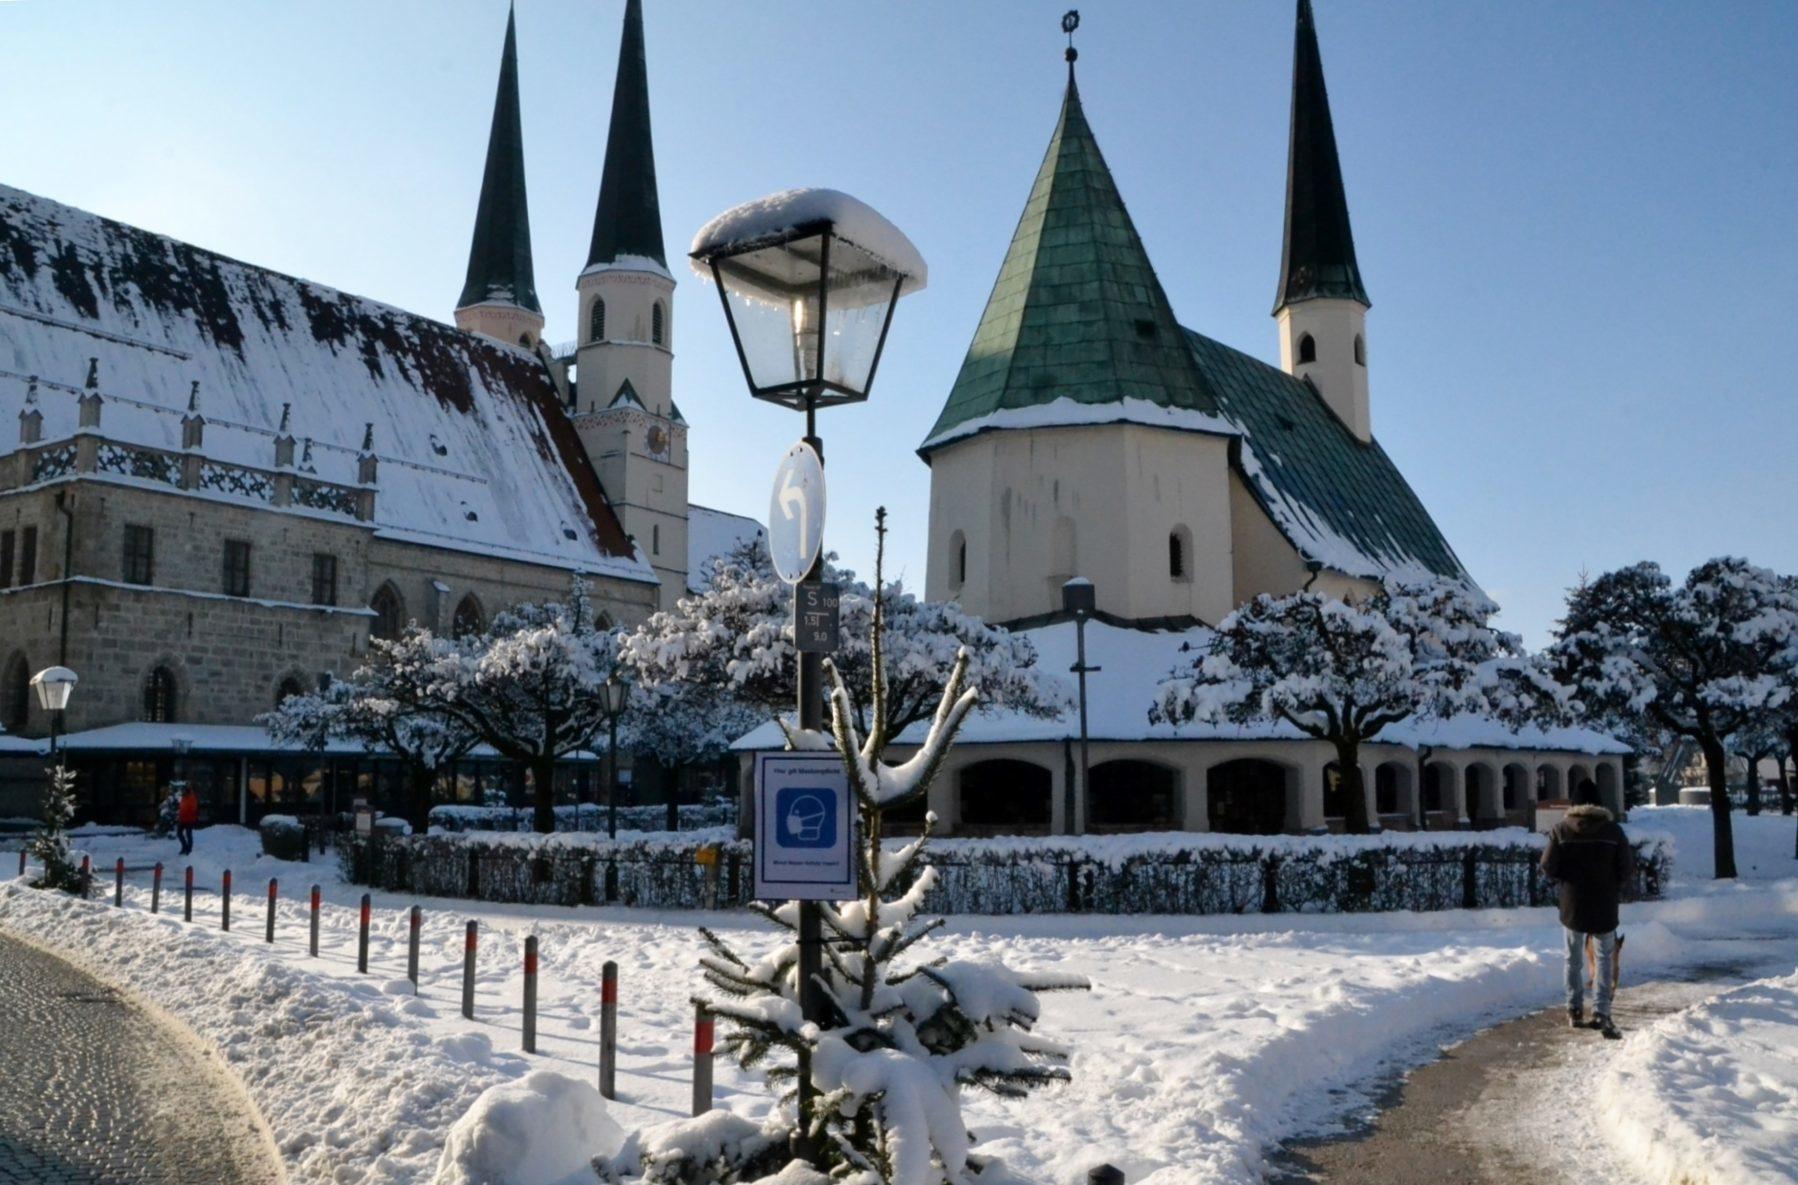 Winter am Kapellplatz Januar 2021 2